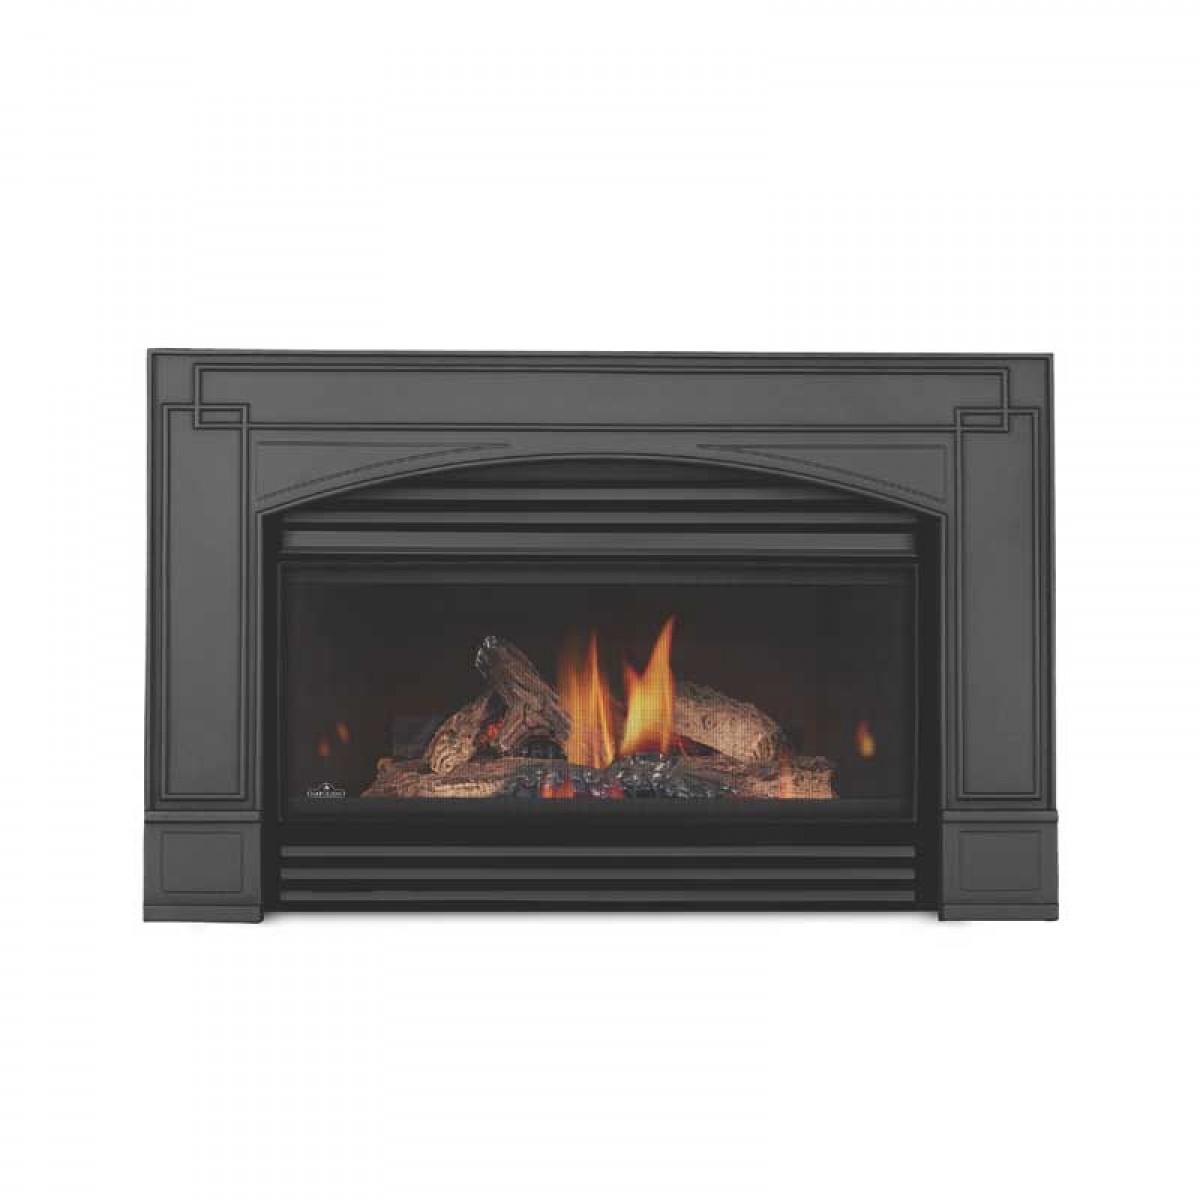 Napoleon Gi 4n Basic Natural Gas Fireplace Insert W